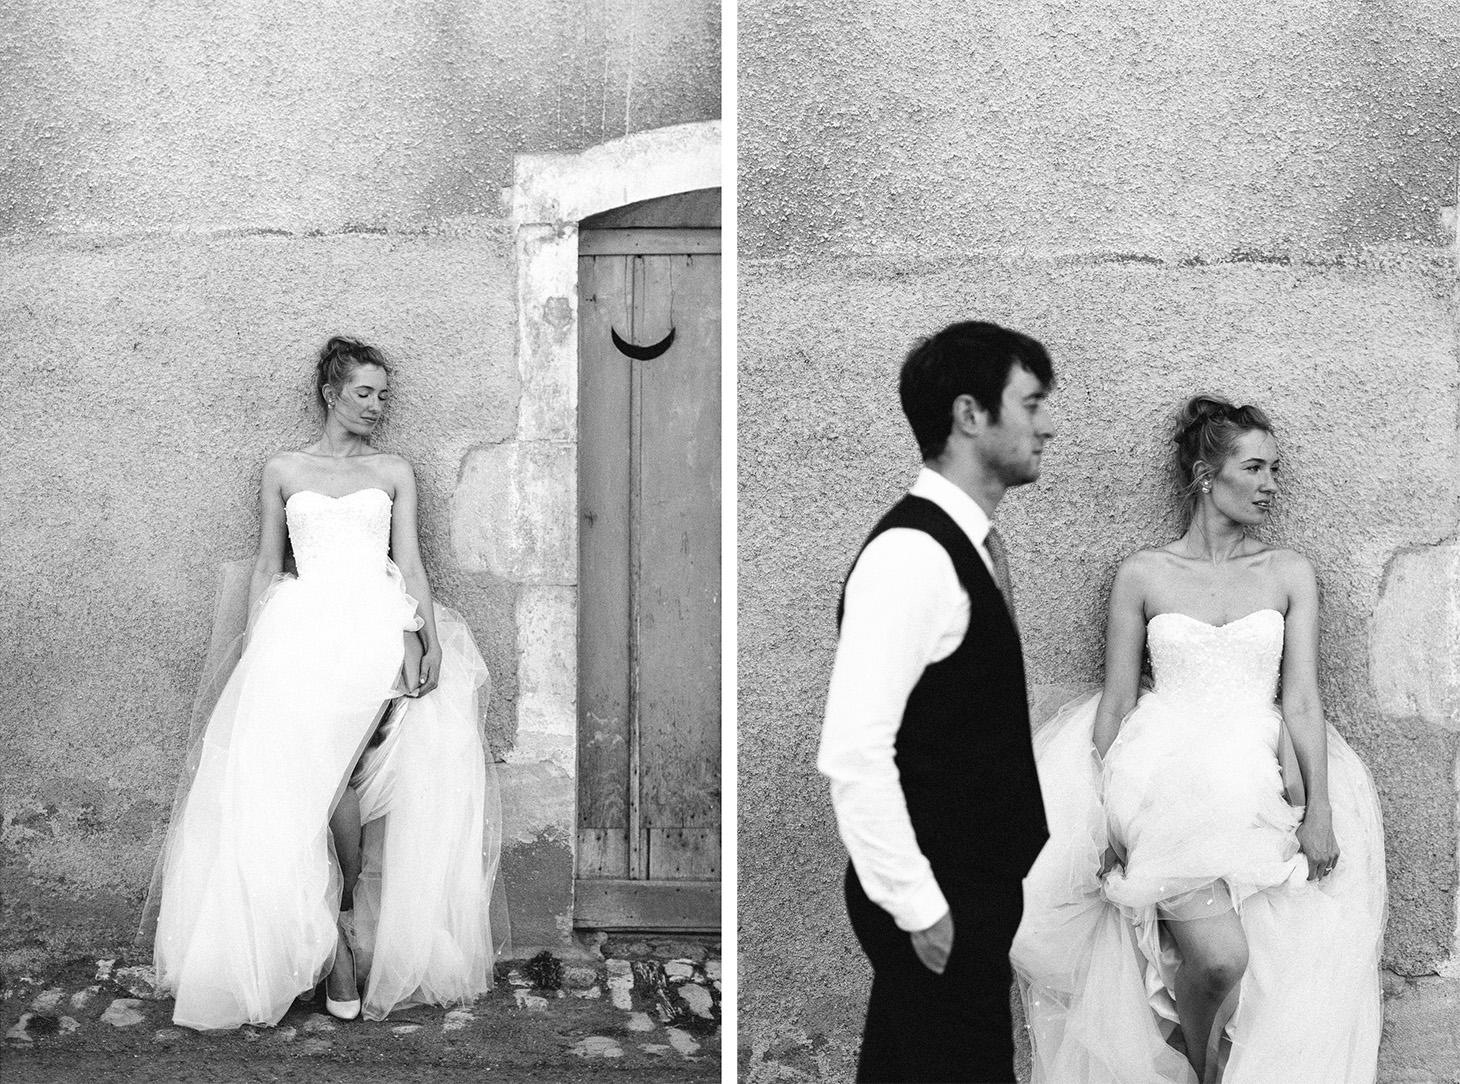 bourgogne_wedding_photographer_chateau_pommard-054 copie